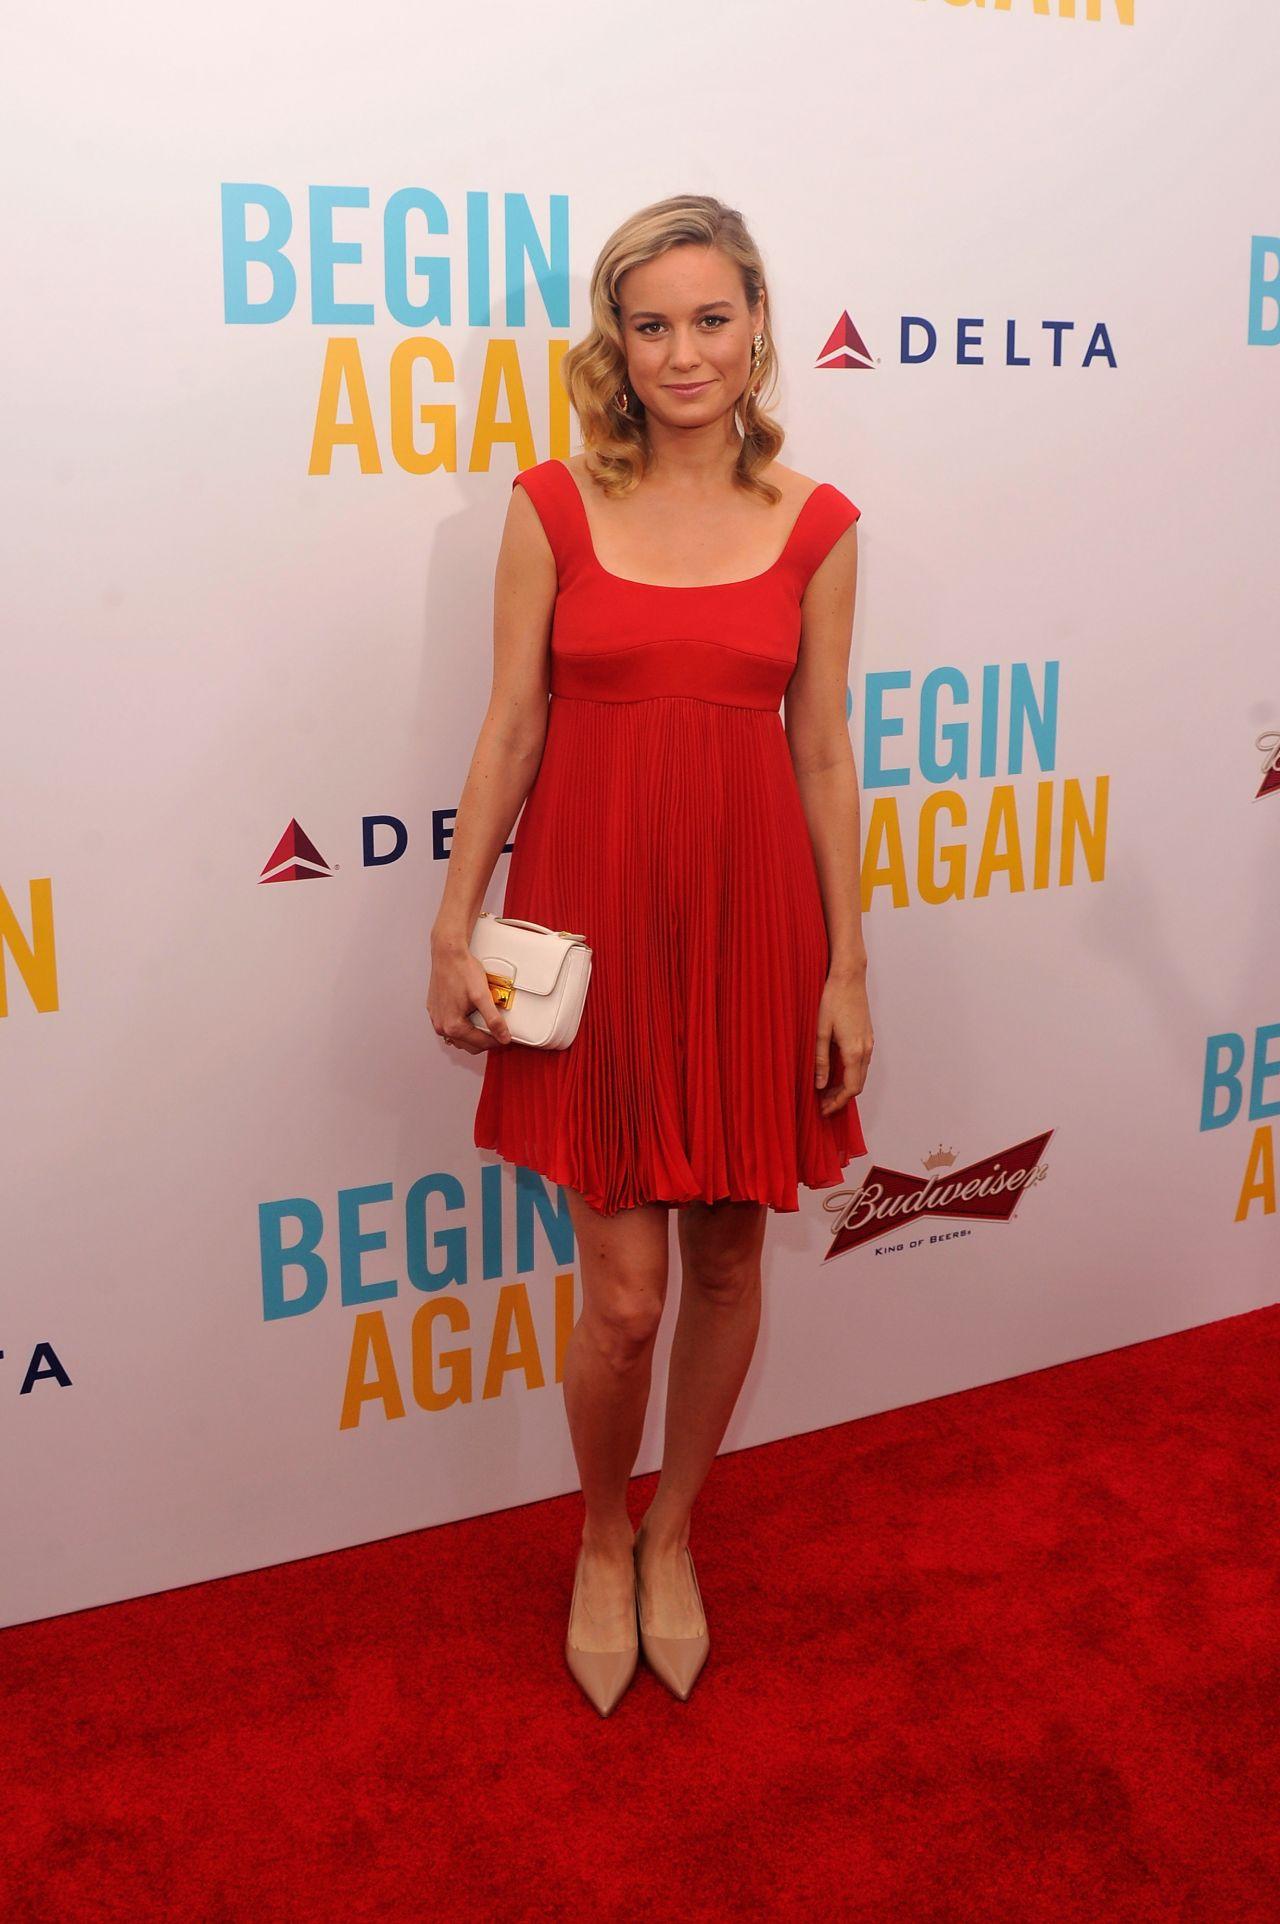 Brie Larson Begin Again Premiere In New York City